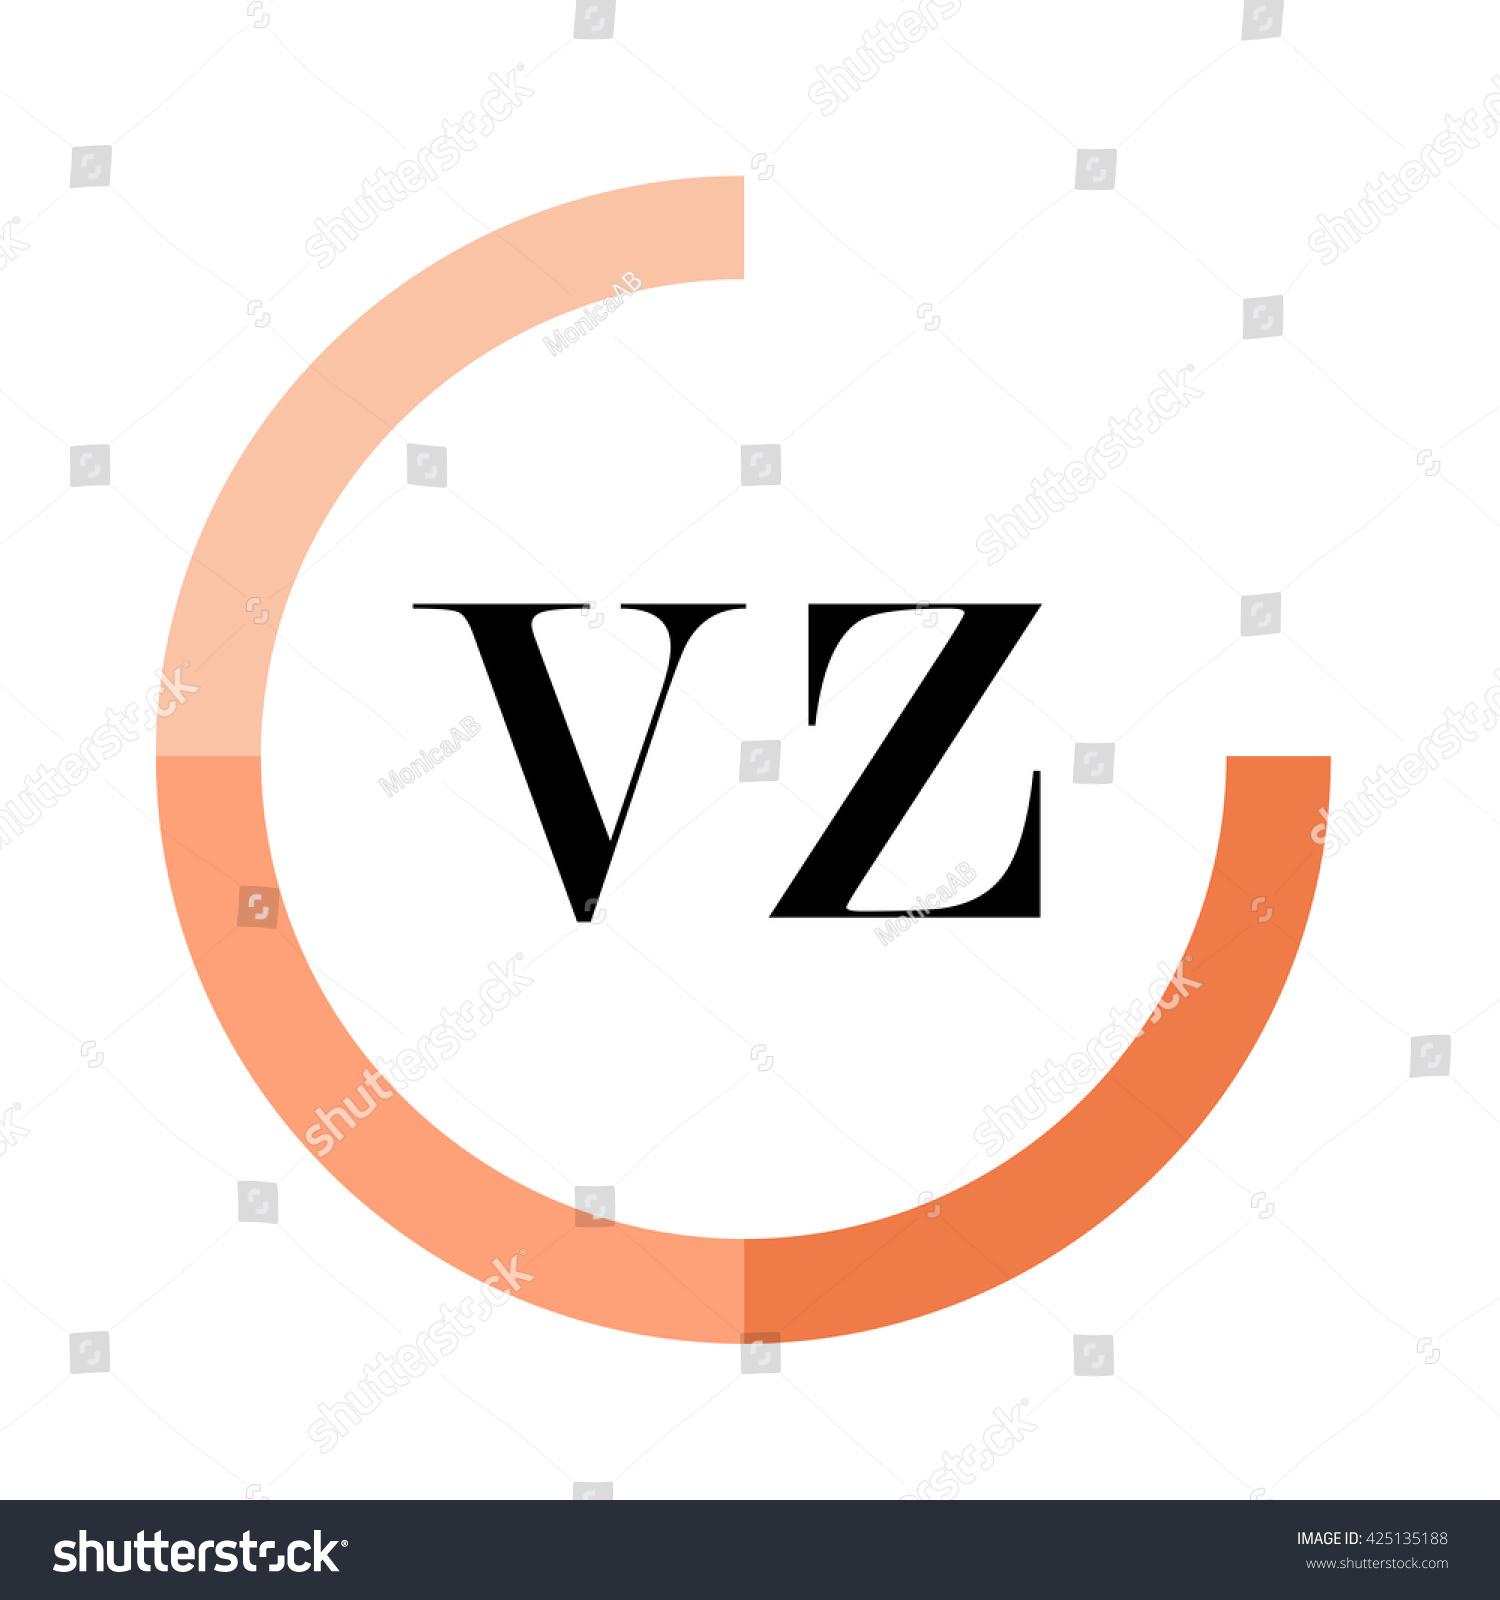 Vz business logo icon design template stock vector 425135188 vz business logo icon design template elements orange color vectors design identity in circle biocorpaavc Image collections